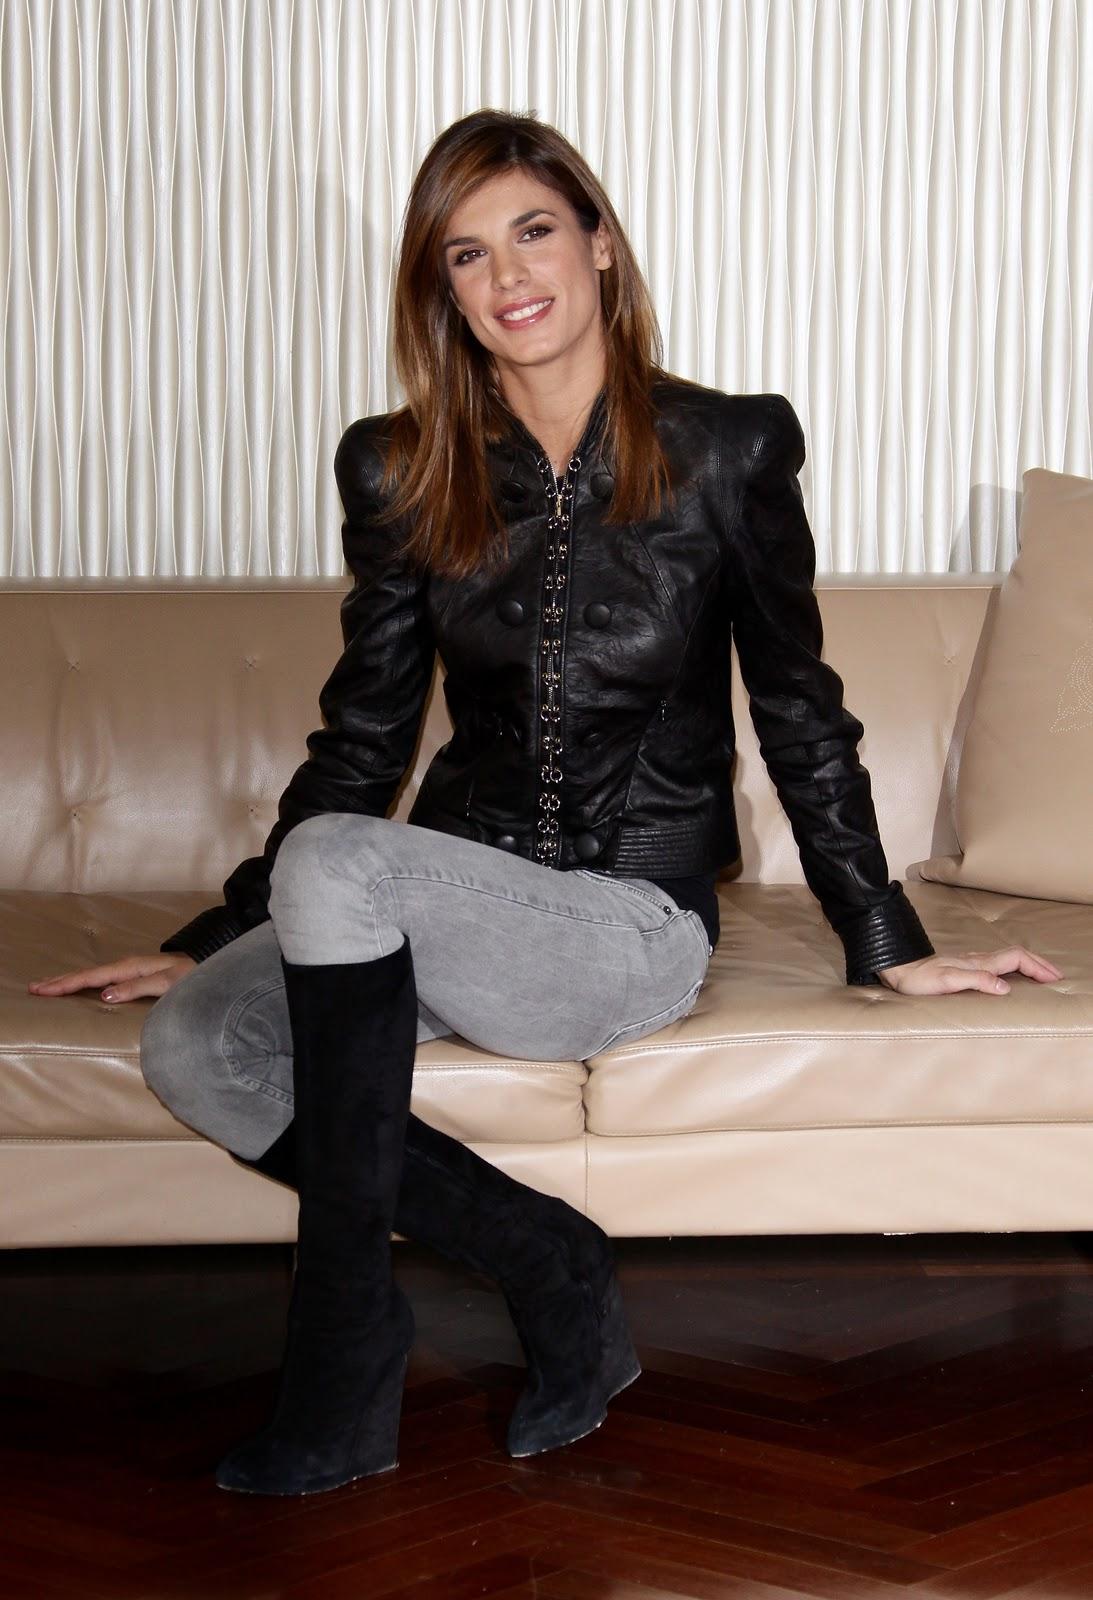 http://3.bp.blogspot.com/_LRzFEyAOGAA/TQswblTp8zI/AAAAAAAAD5k/xPeIca8KBis/s1600/27272_Tikipeter_Elisabetta_Canalis_A_Natale_mi_sposo_Photocall_006_122_34lo.jpg